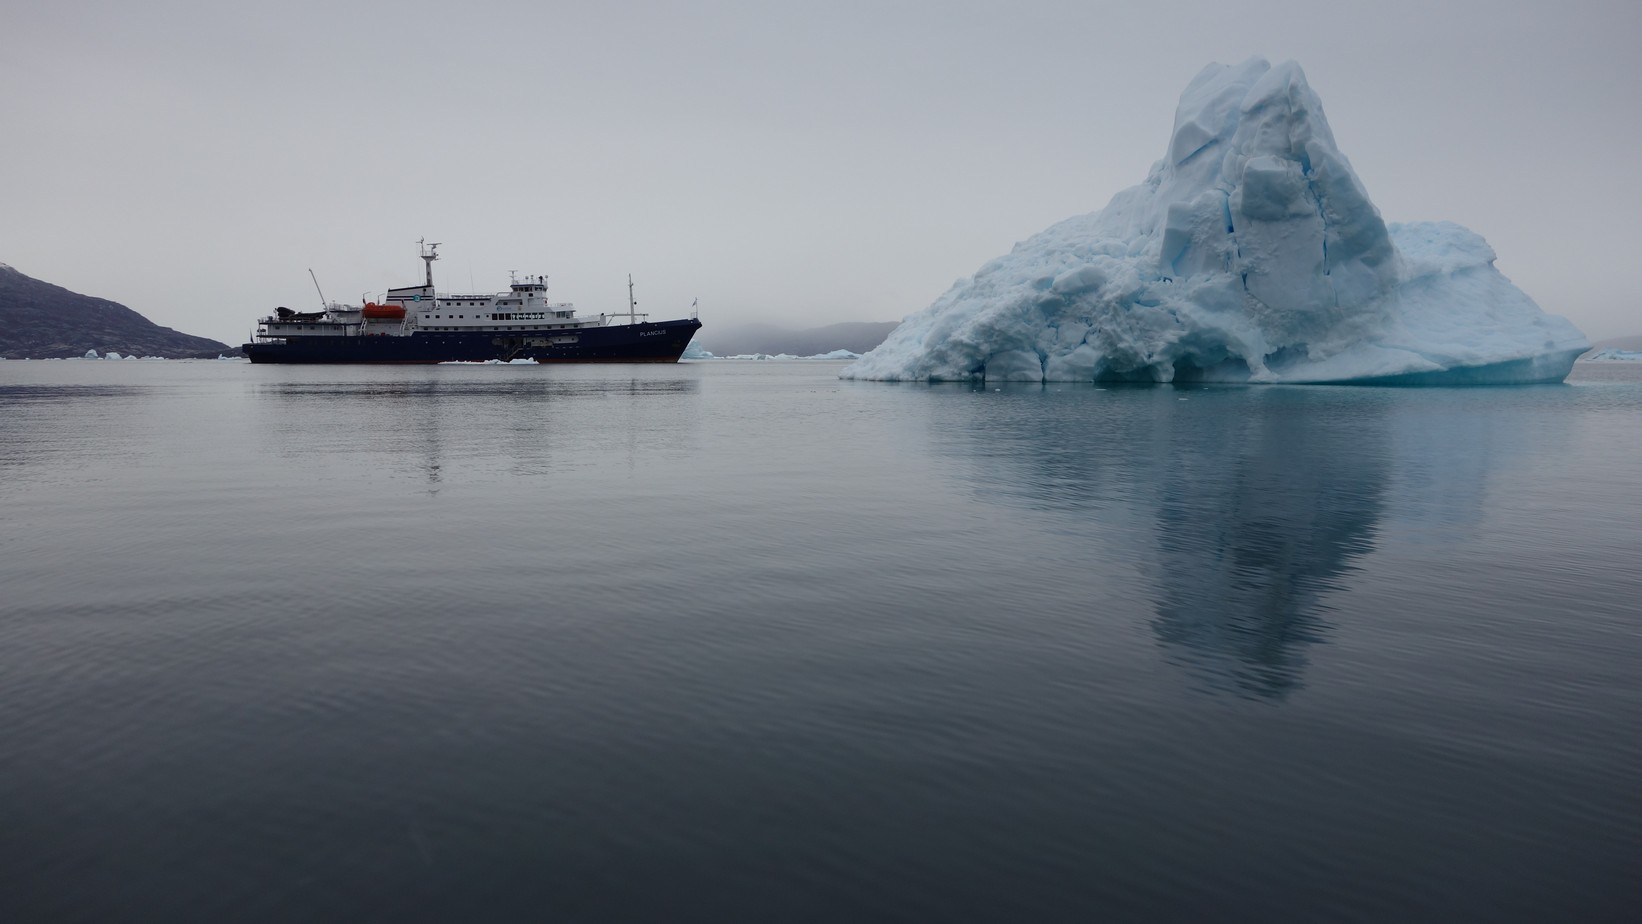 Groenland 2015 ms. Plancius NRC- Academie-reis